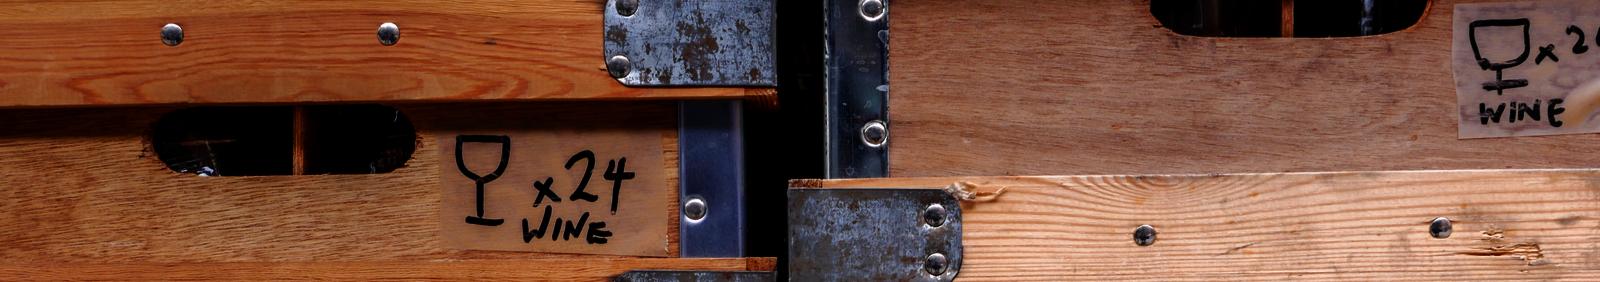 Tématické krabice